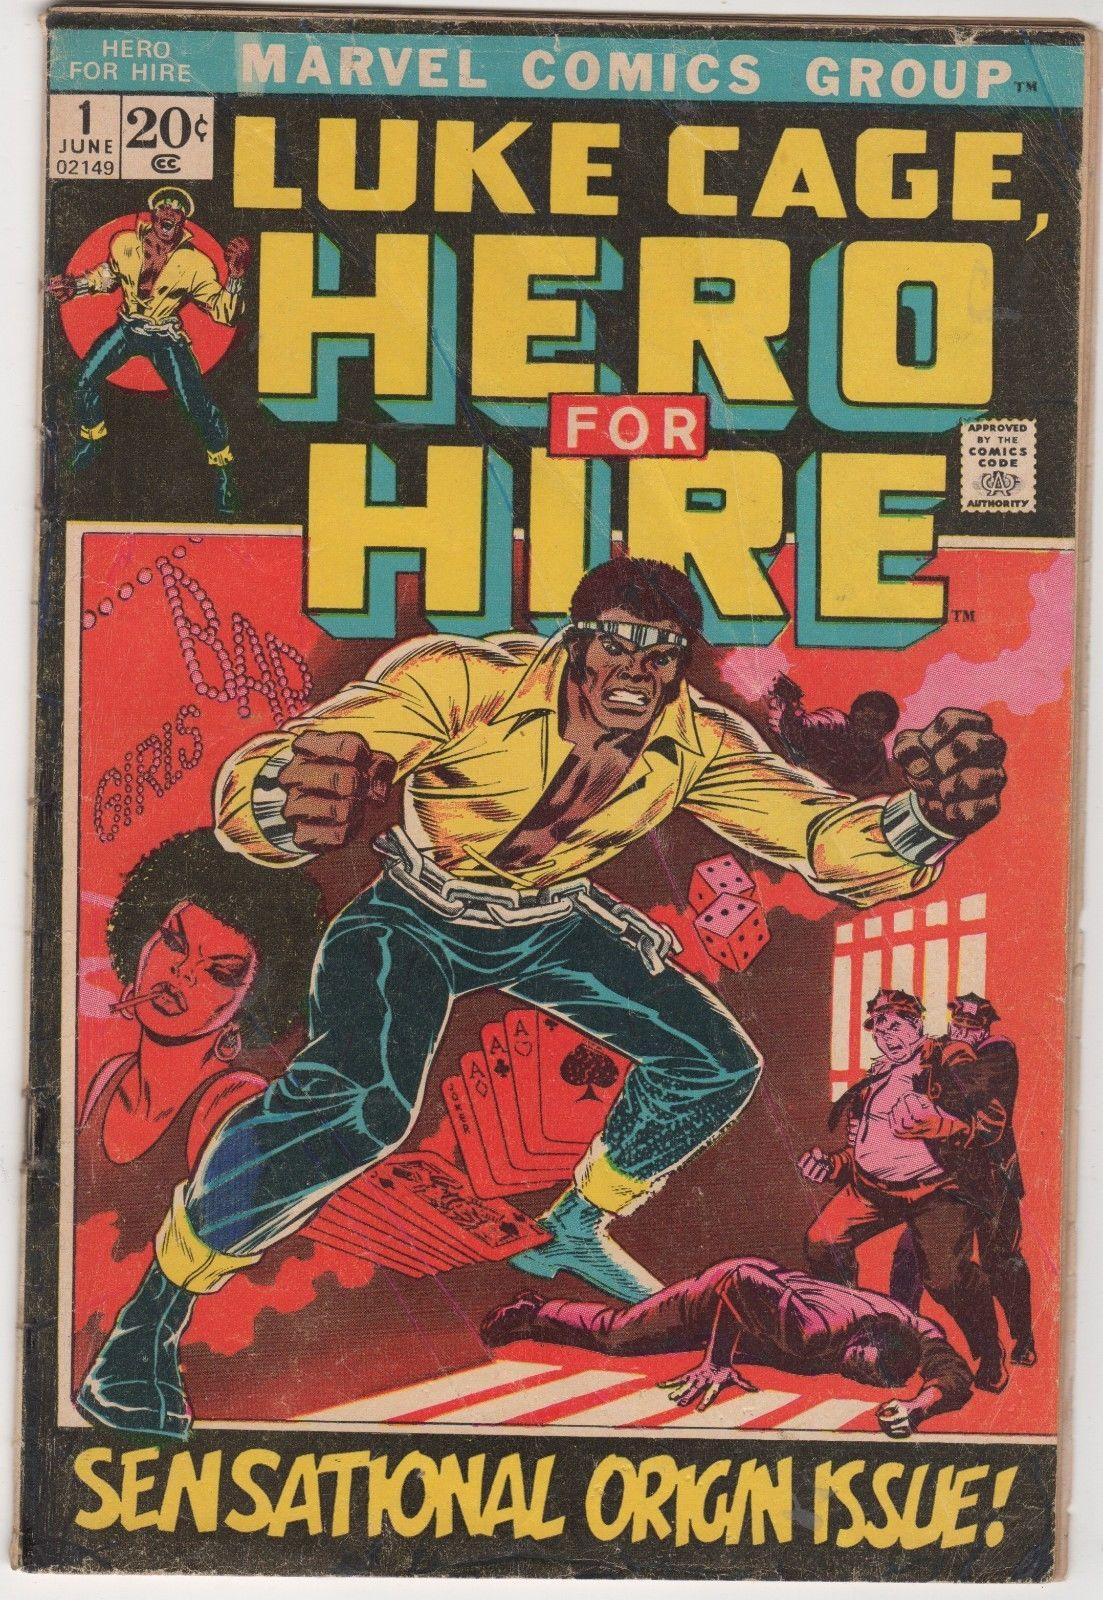 Marvel Comics LUKE CAGE HERO FOR HIRE #1 (June 1972) Origin Issue. WoW